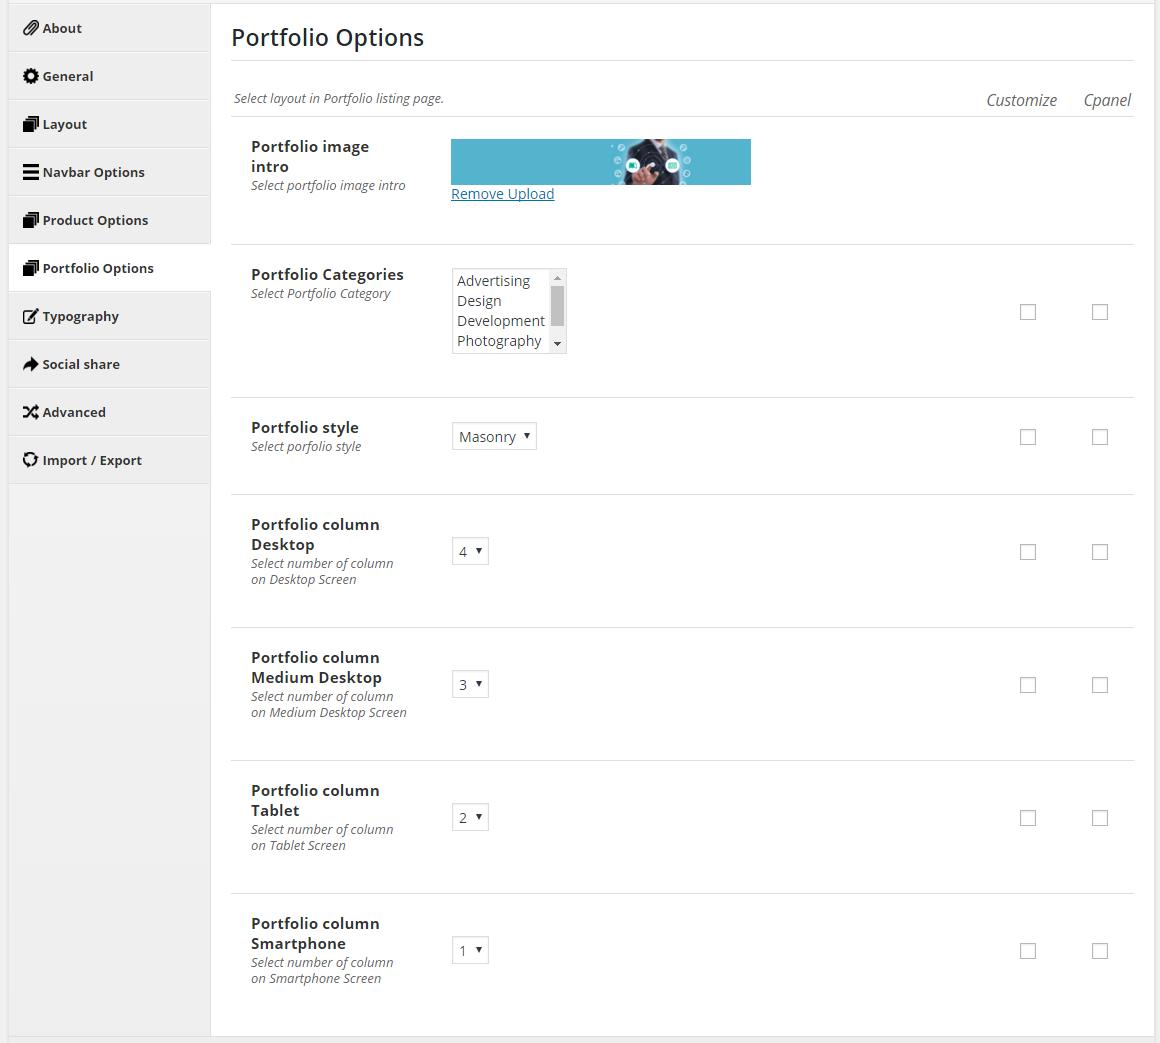 portfolio-options